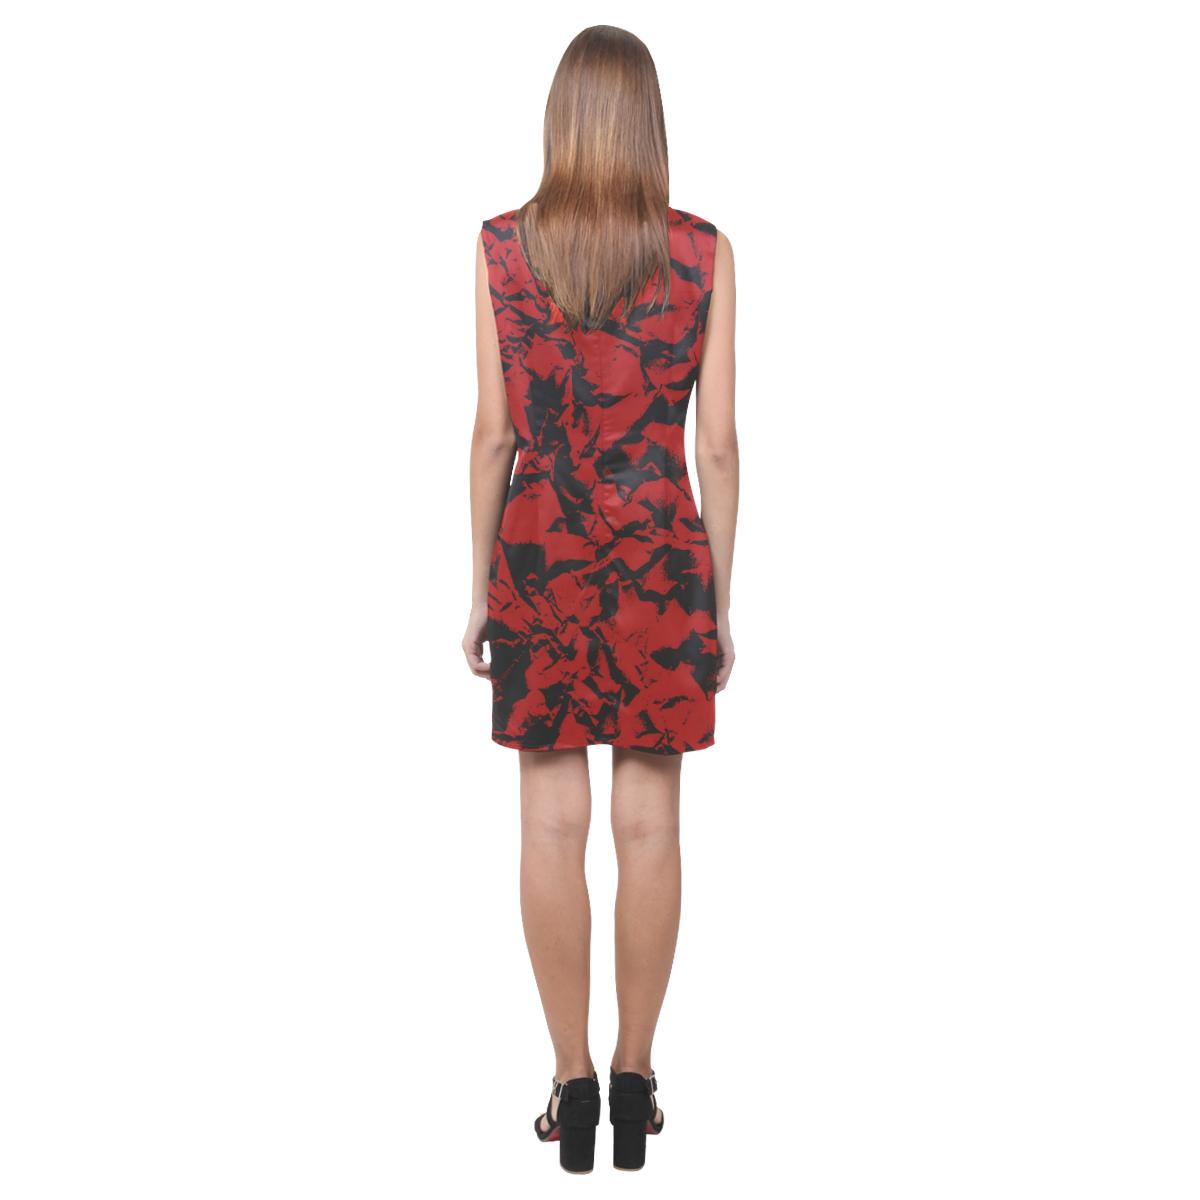 arruga vneck dress Phoebe Sleeveless V-Neck Dress (Model D09)